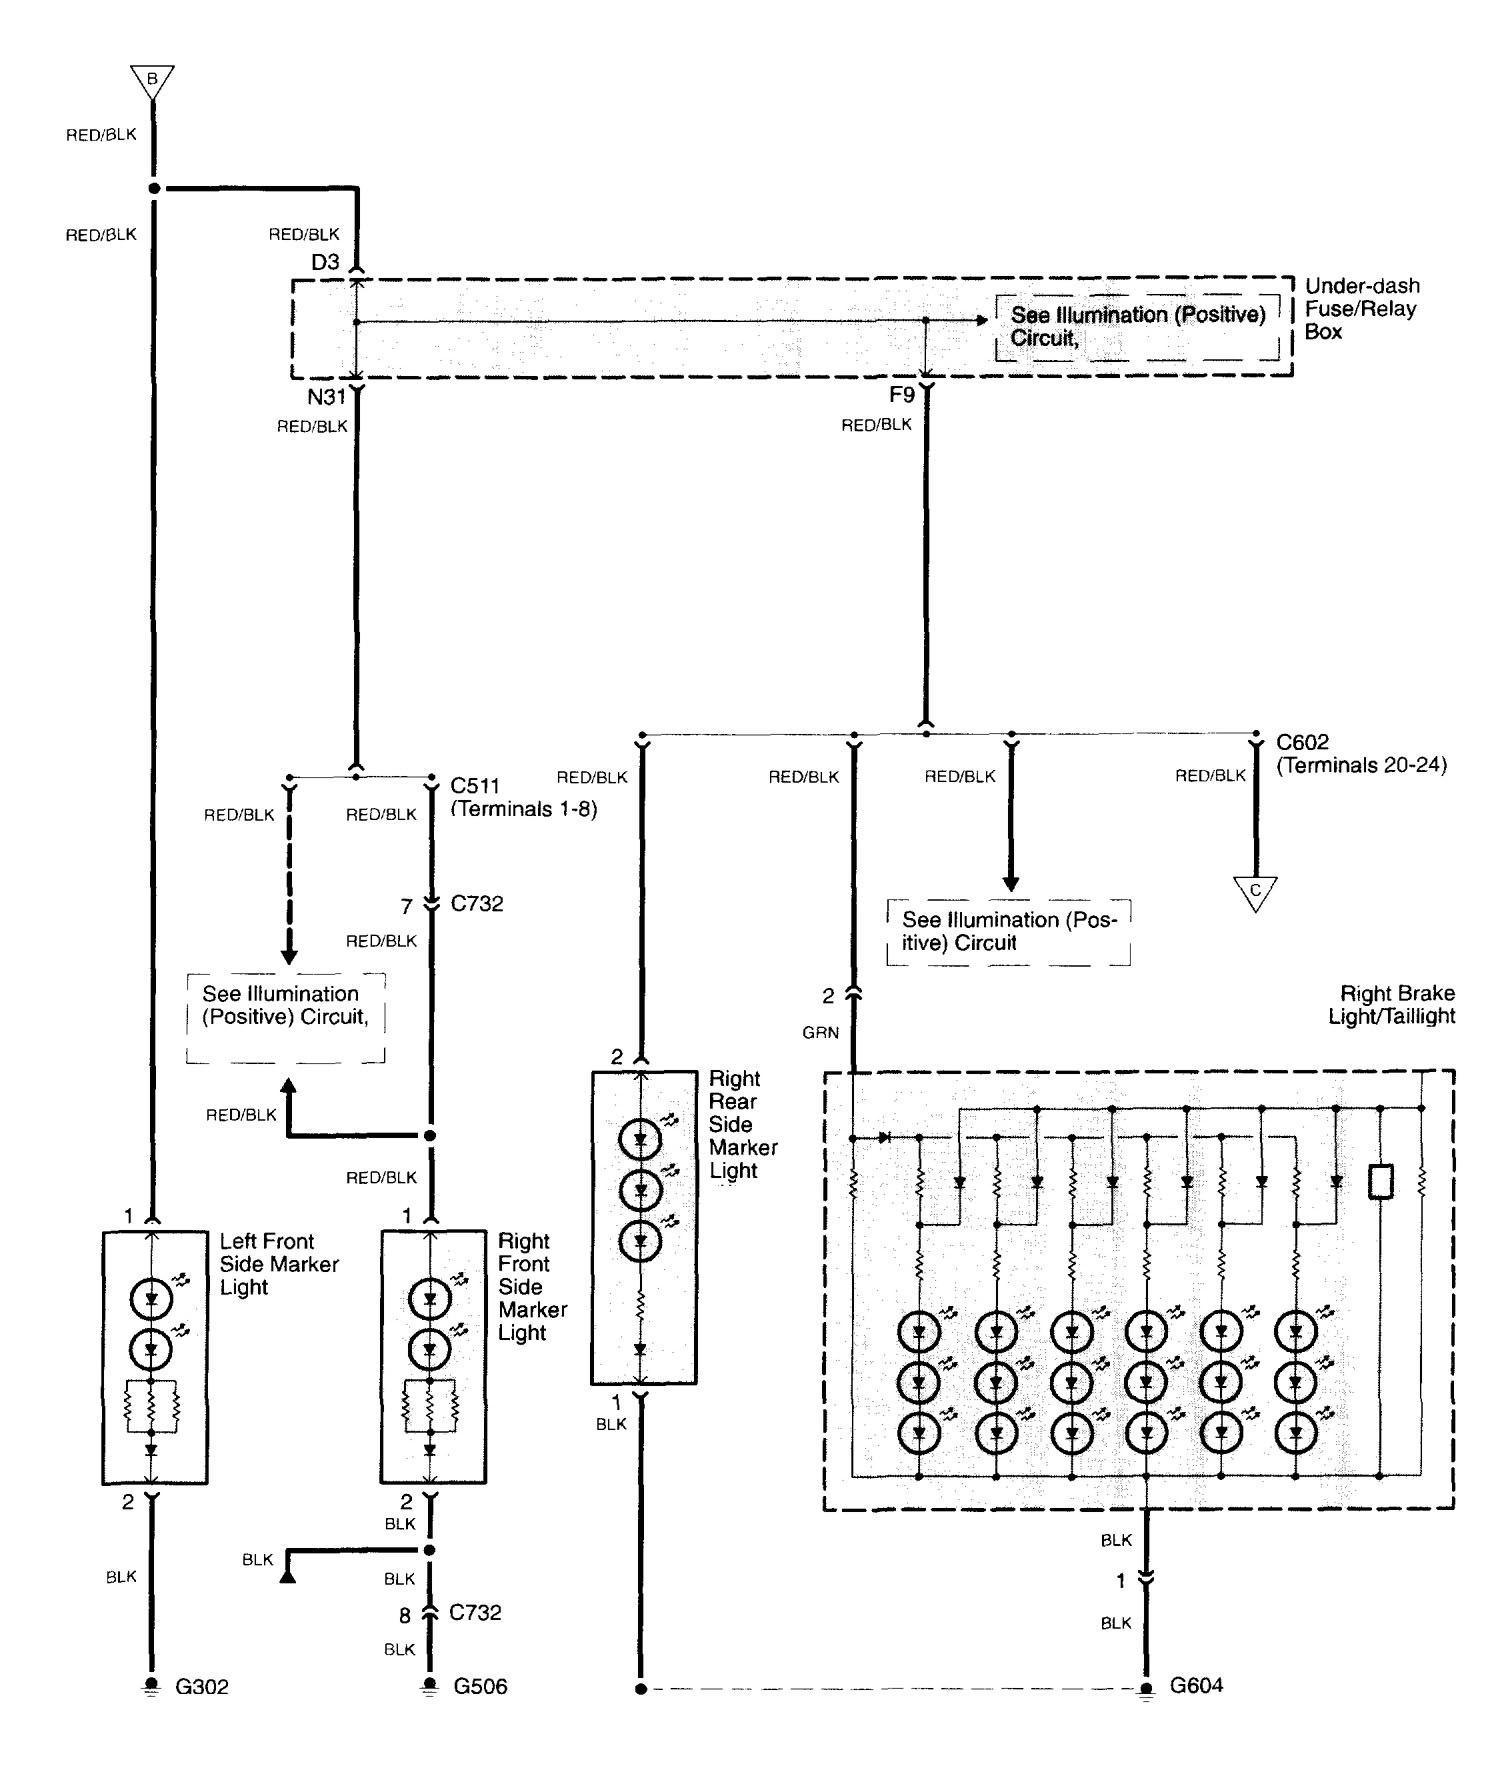 Acura TL (2003 - 2006) - wiring diagrams - license plate lamp ... on 03 lincoln navigator wiring diagram, 03 hyundai tiburon wiring diagram, 03 kia sedona wiring diagram, 03 chrysler 300m wiring diagram, 03 buick century wiring diagram, 03 hyundai santa fe wiring diagram, 03 buick lesabre wiring diagram, 03 saturn ion wiring diagram, 03 mitsubishi eclipse wiring diagram, 03 jeep wrangler wiring diagram, 03 dodge dakota wiring diagram, 03 nissan frontier wiring diagram, 03 mazda 6 wiring diagram, 03 saab 9-3 wiring diagram, 03 pontiac vibe wiring diagram, 03 ford windstar wiring diagram, 03 nissan 350z wiring diagram, 03 kia sorento wiring diagram, 03 buick regal wiring diagram,